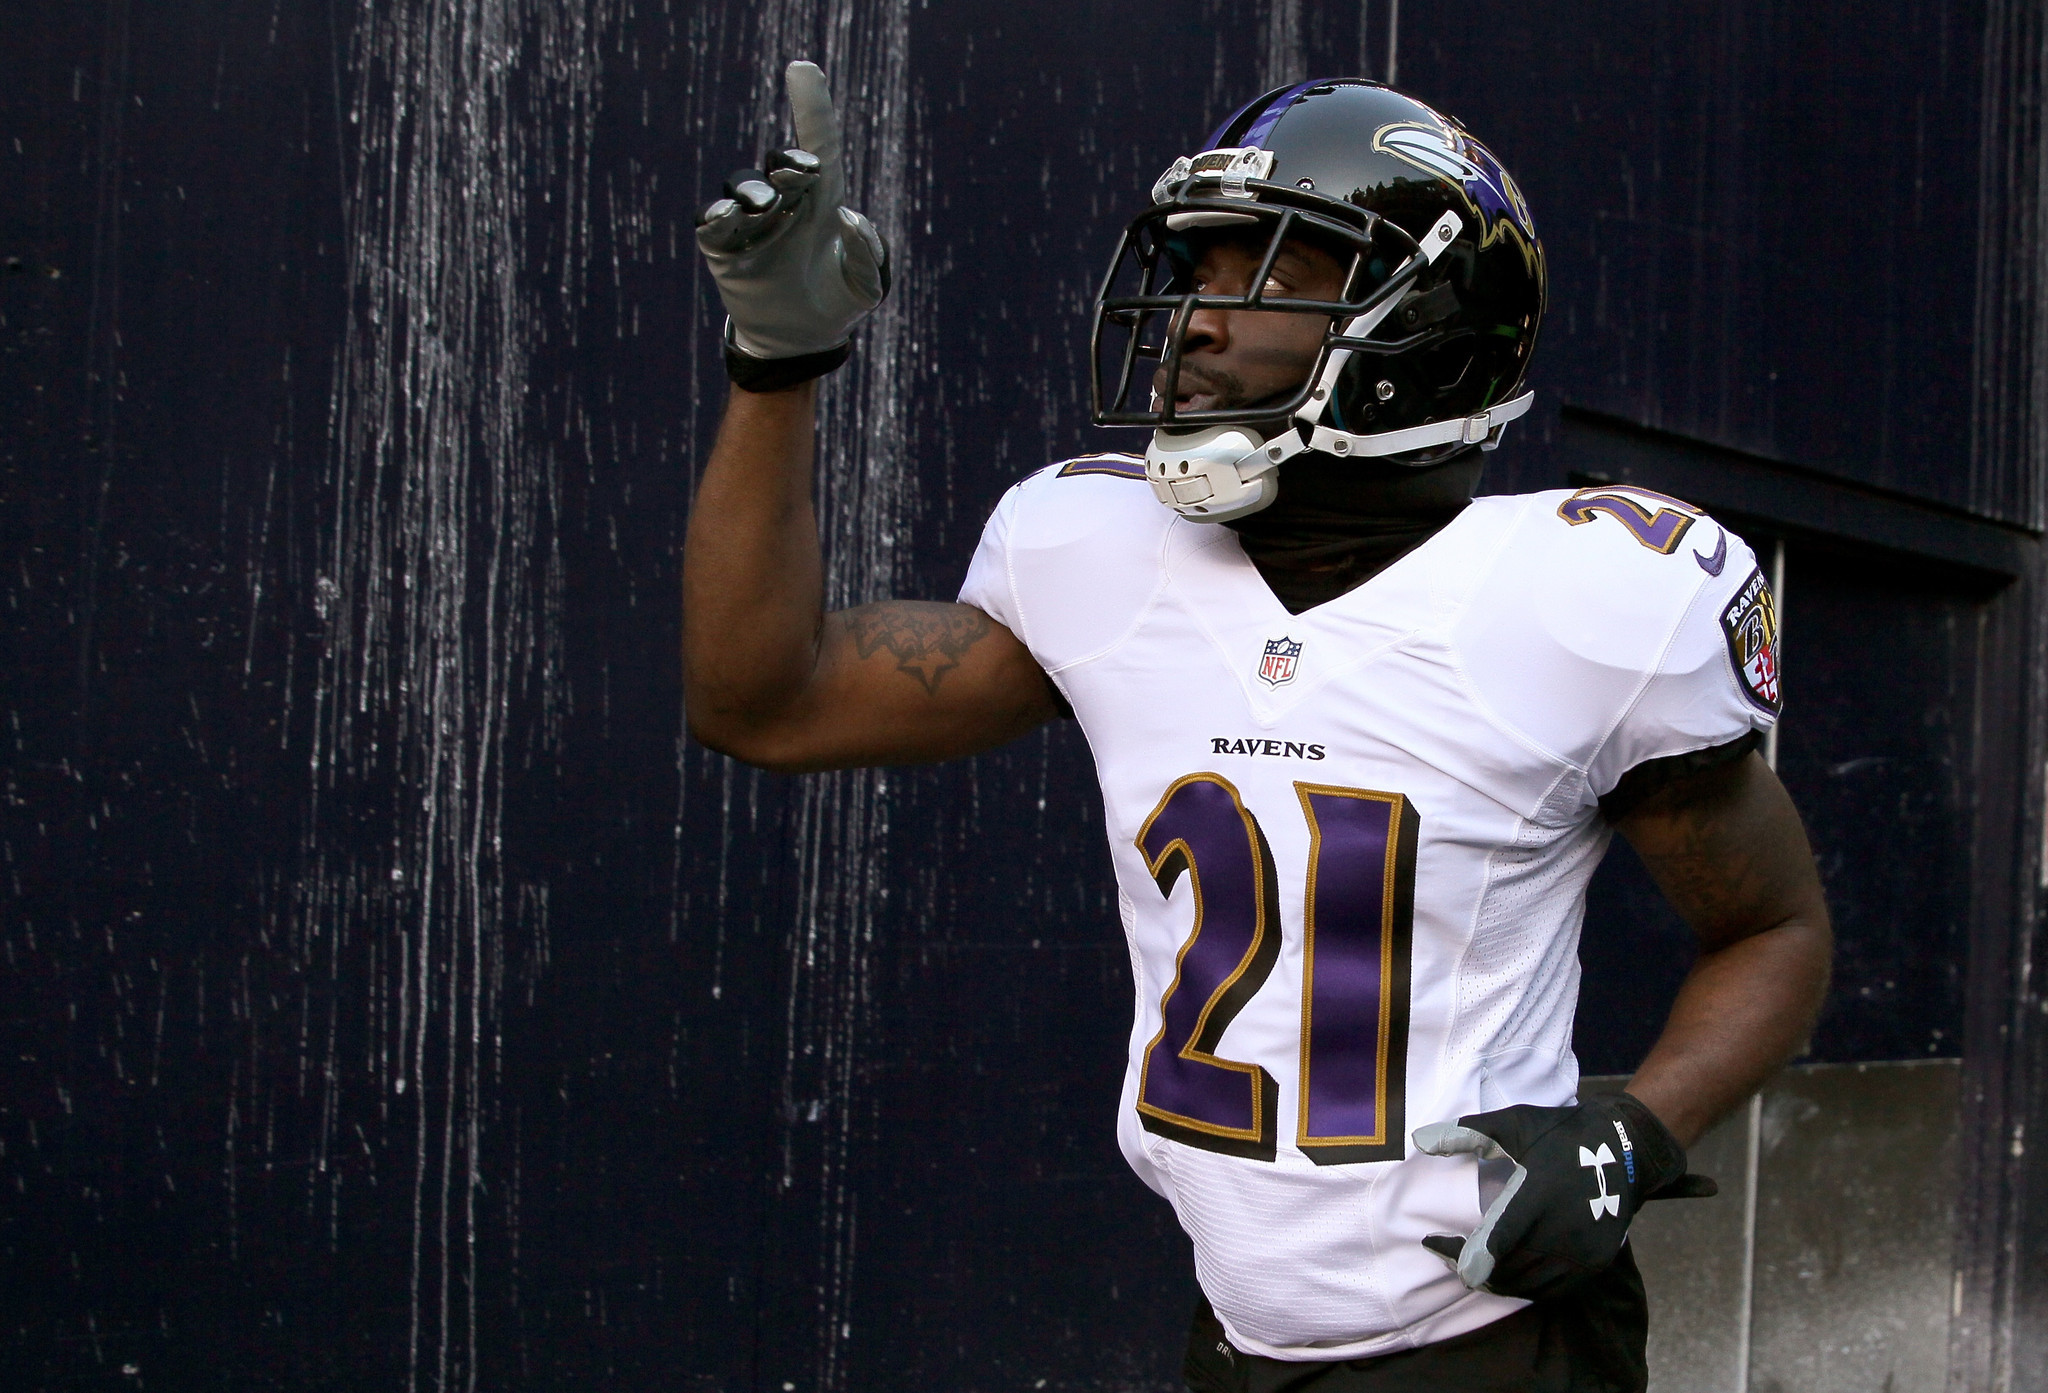 Lardarius Webb hoping to finish career with Ravens after restru…